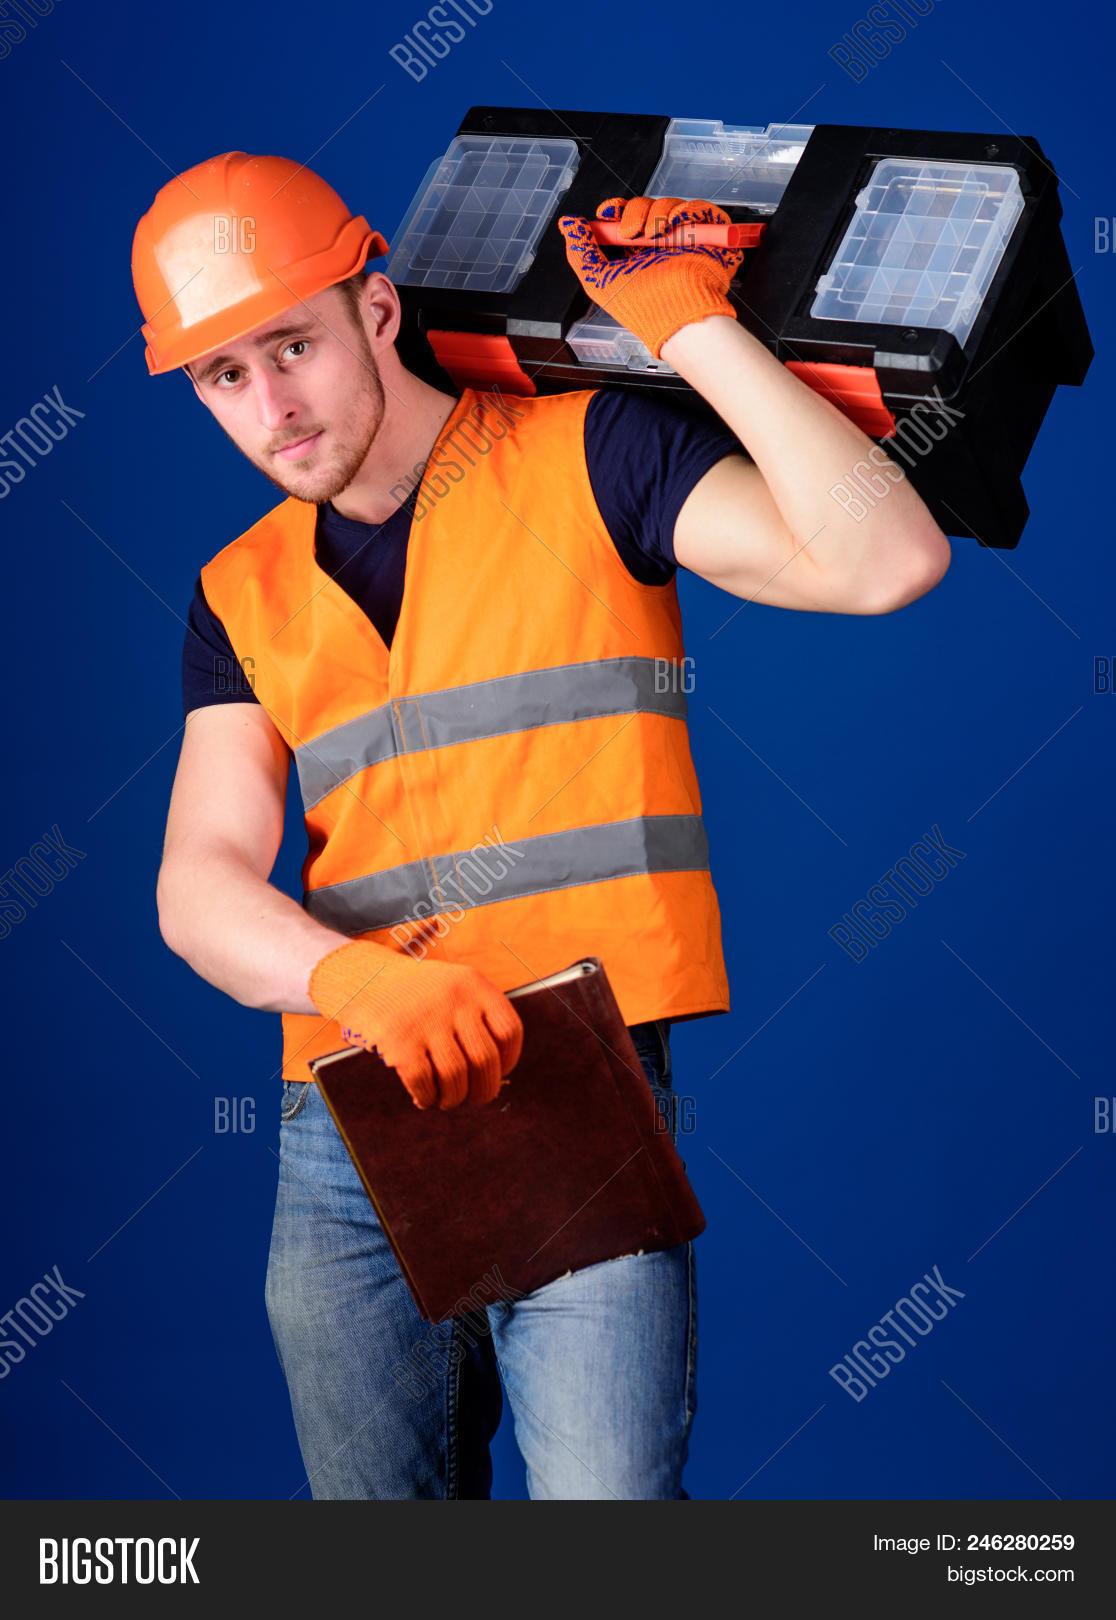 background,beard,bearded,blue,build,builder,calm,carry,case,caucasian,concept,construction,constructor,contractor,developer,document,engineering,equipment,face,fix,folder,guy,handsome,hard,hat,helmet,helpful,hold,laborer,man,mechanic,problem,professional,ready,repair,repairer,repairman,service,shoulder,solve,strong,technician,tool,toolbox,uniform,unshaven,work,worker